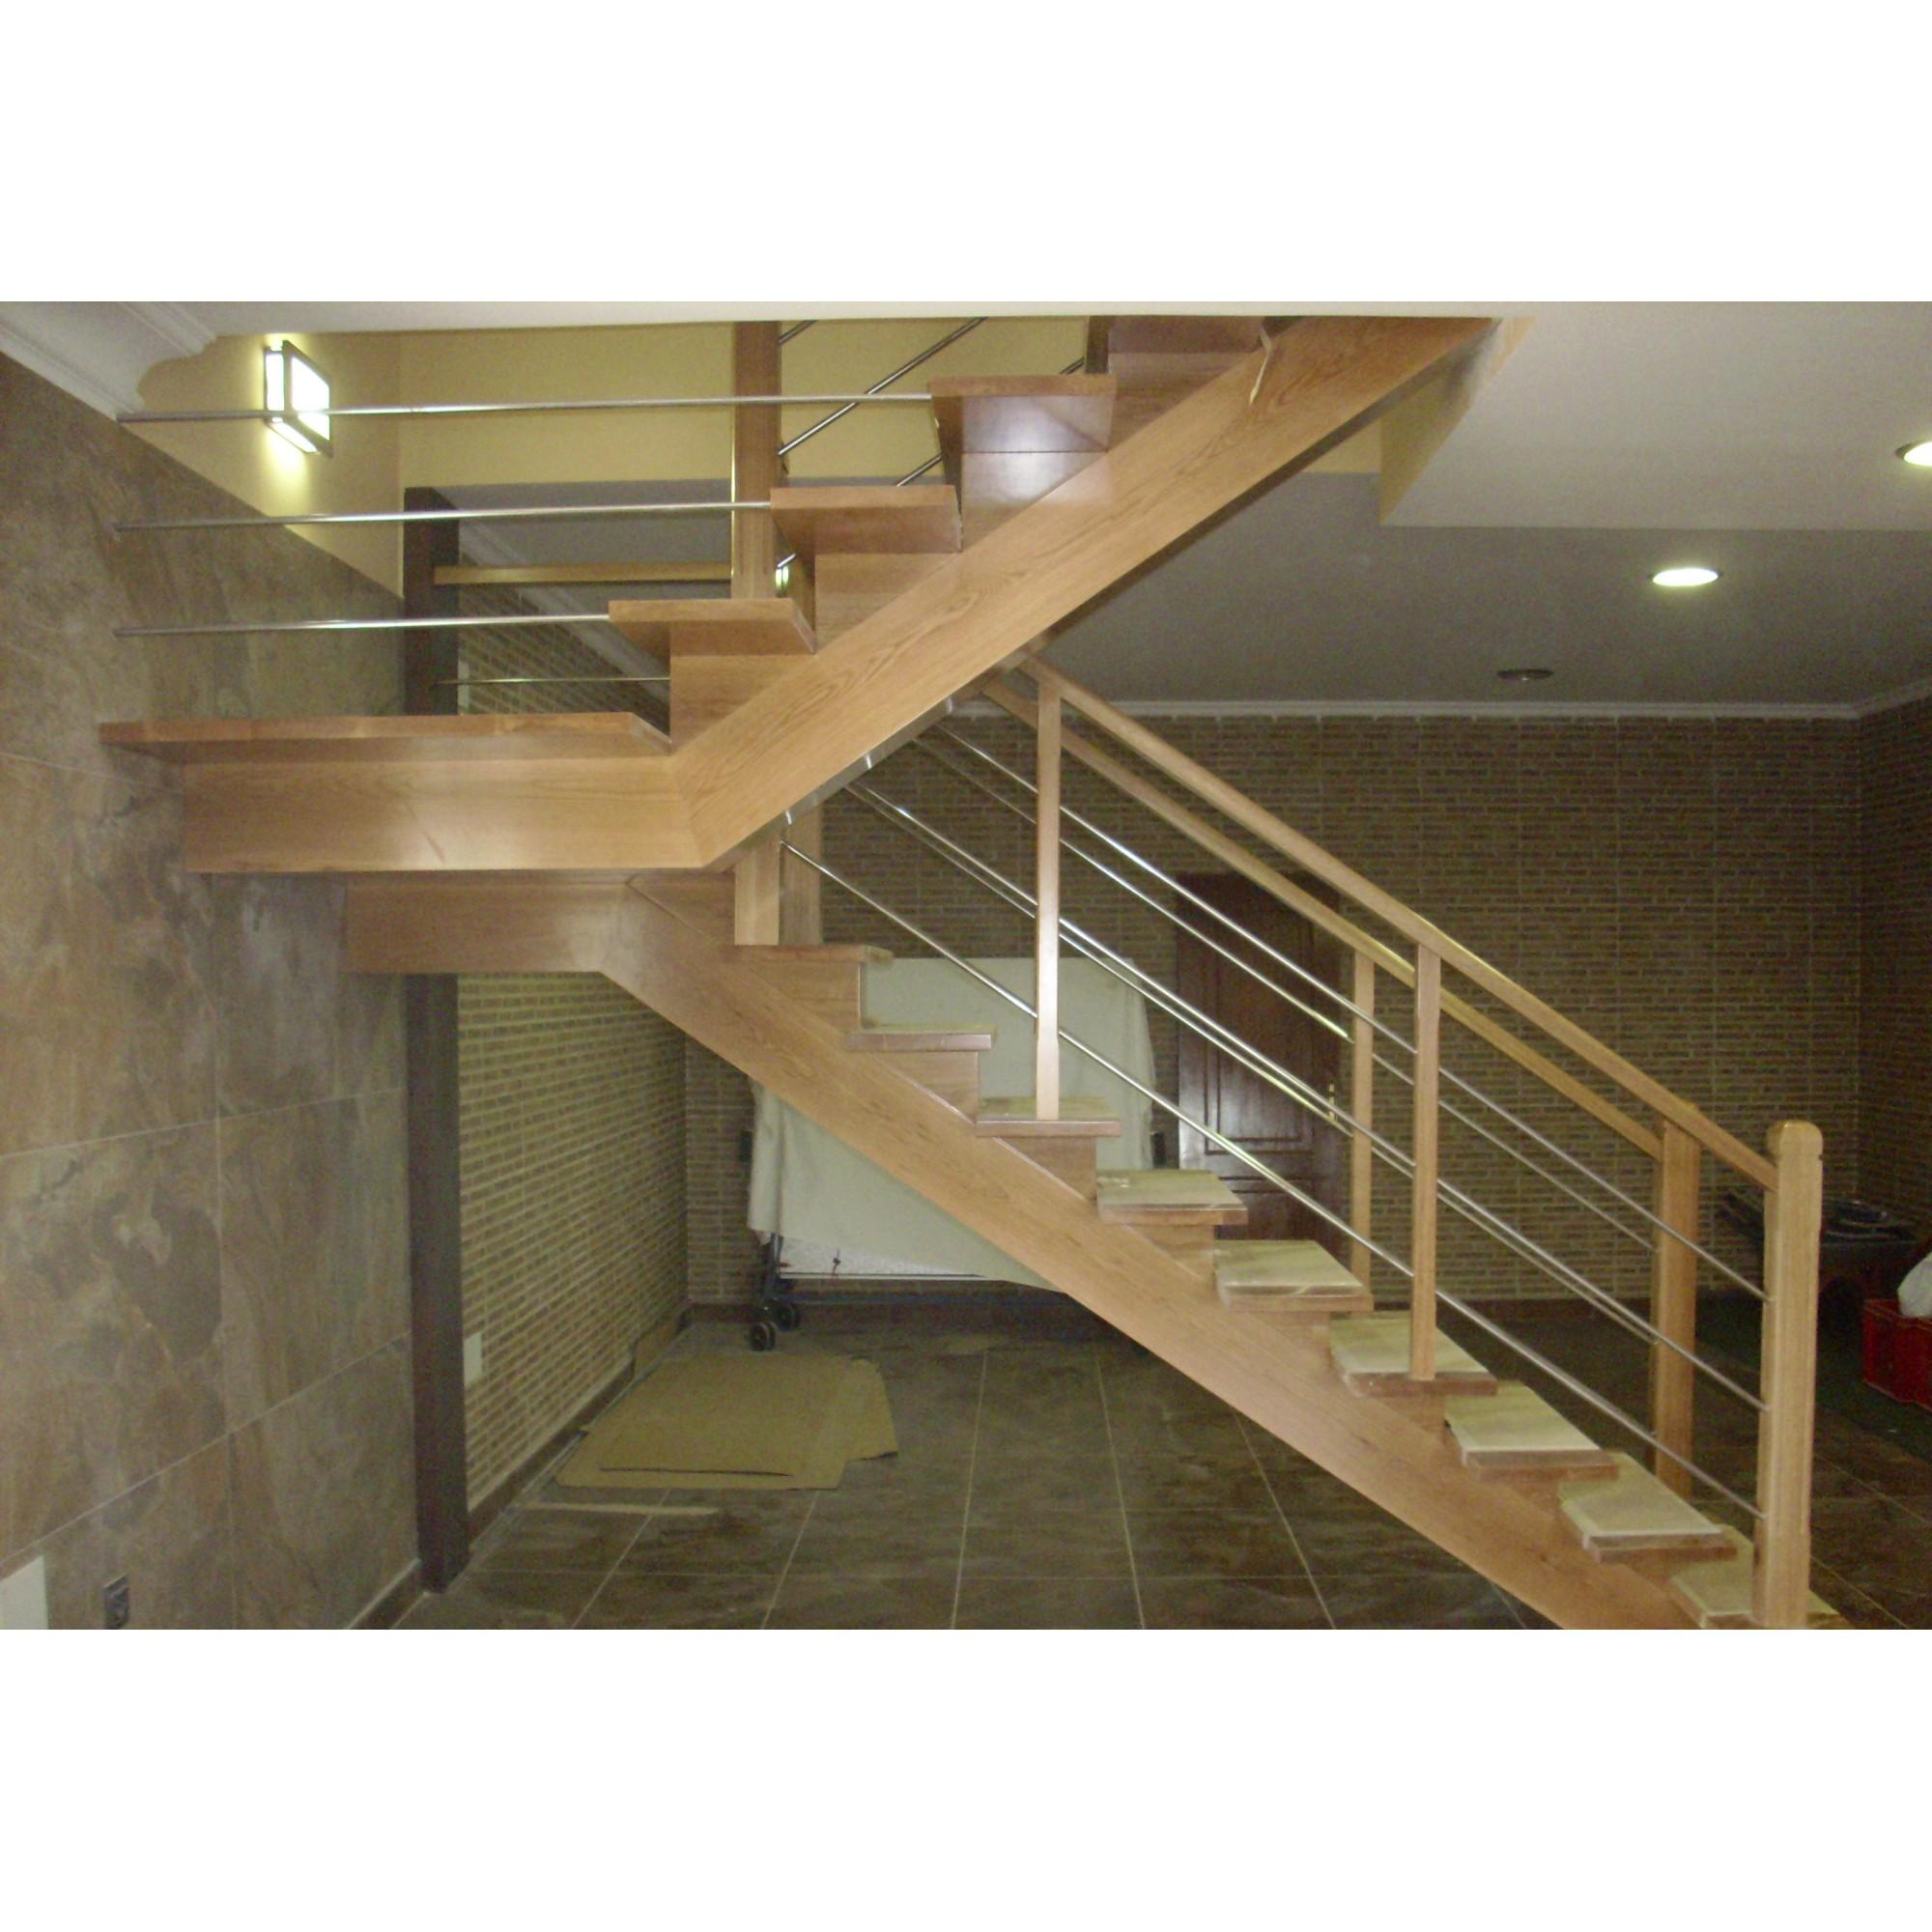 Escalera madera interior a medida combinada for Escalera de medidas